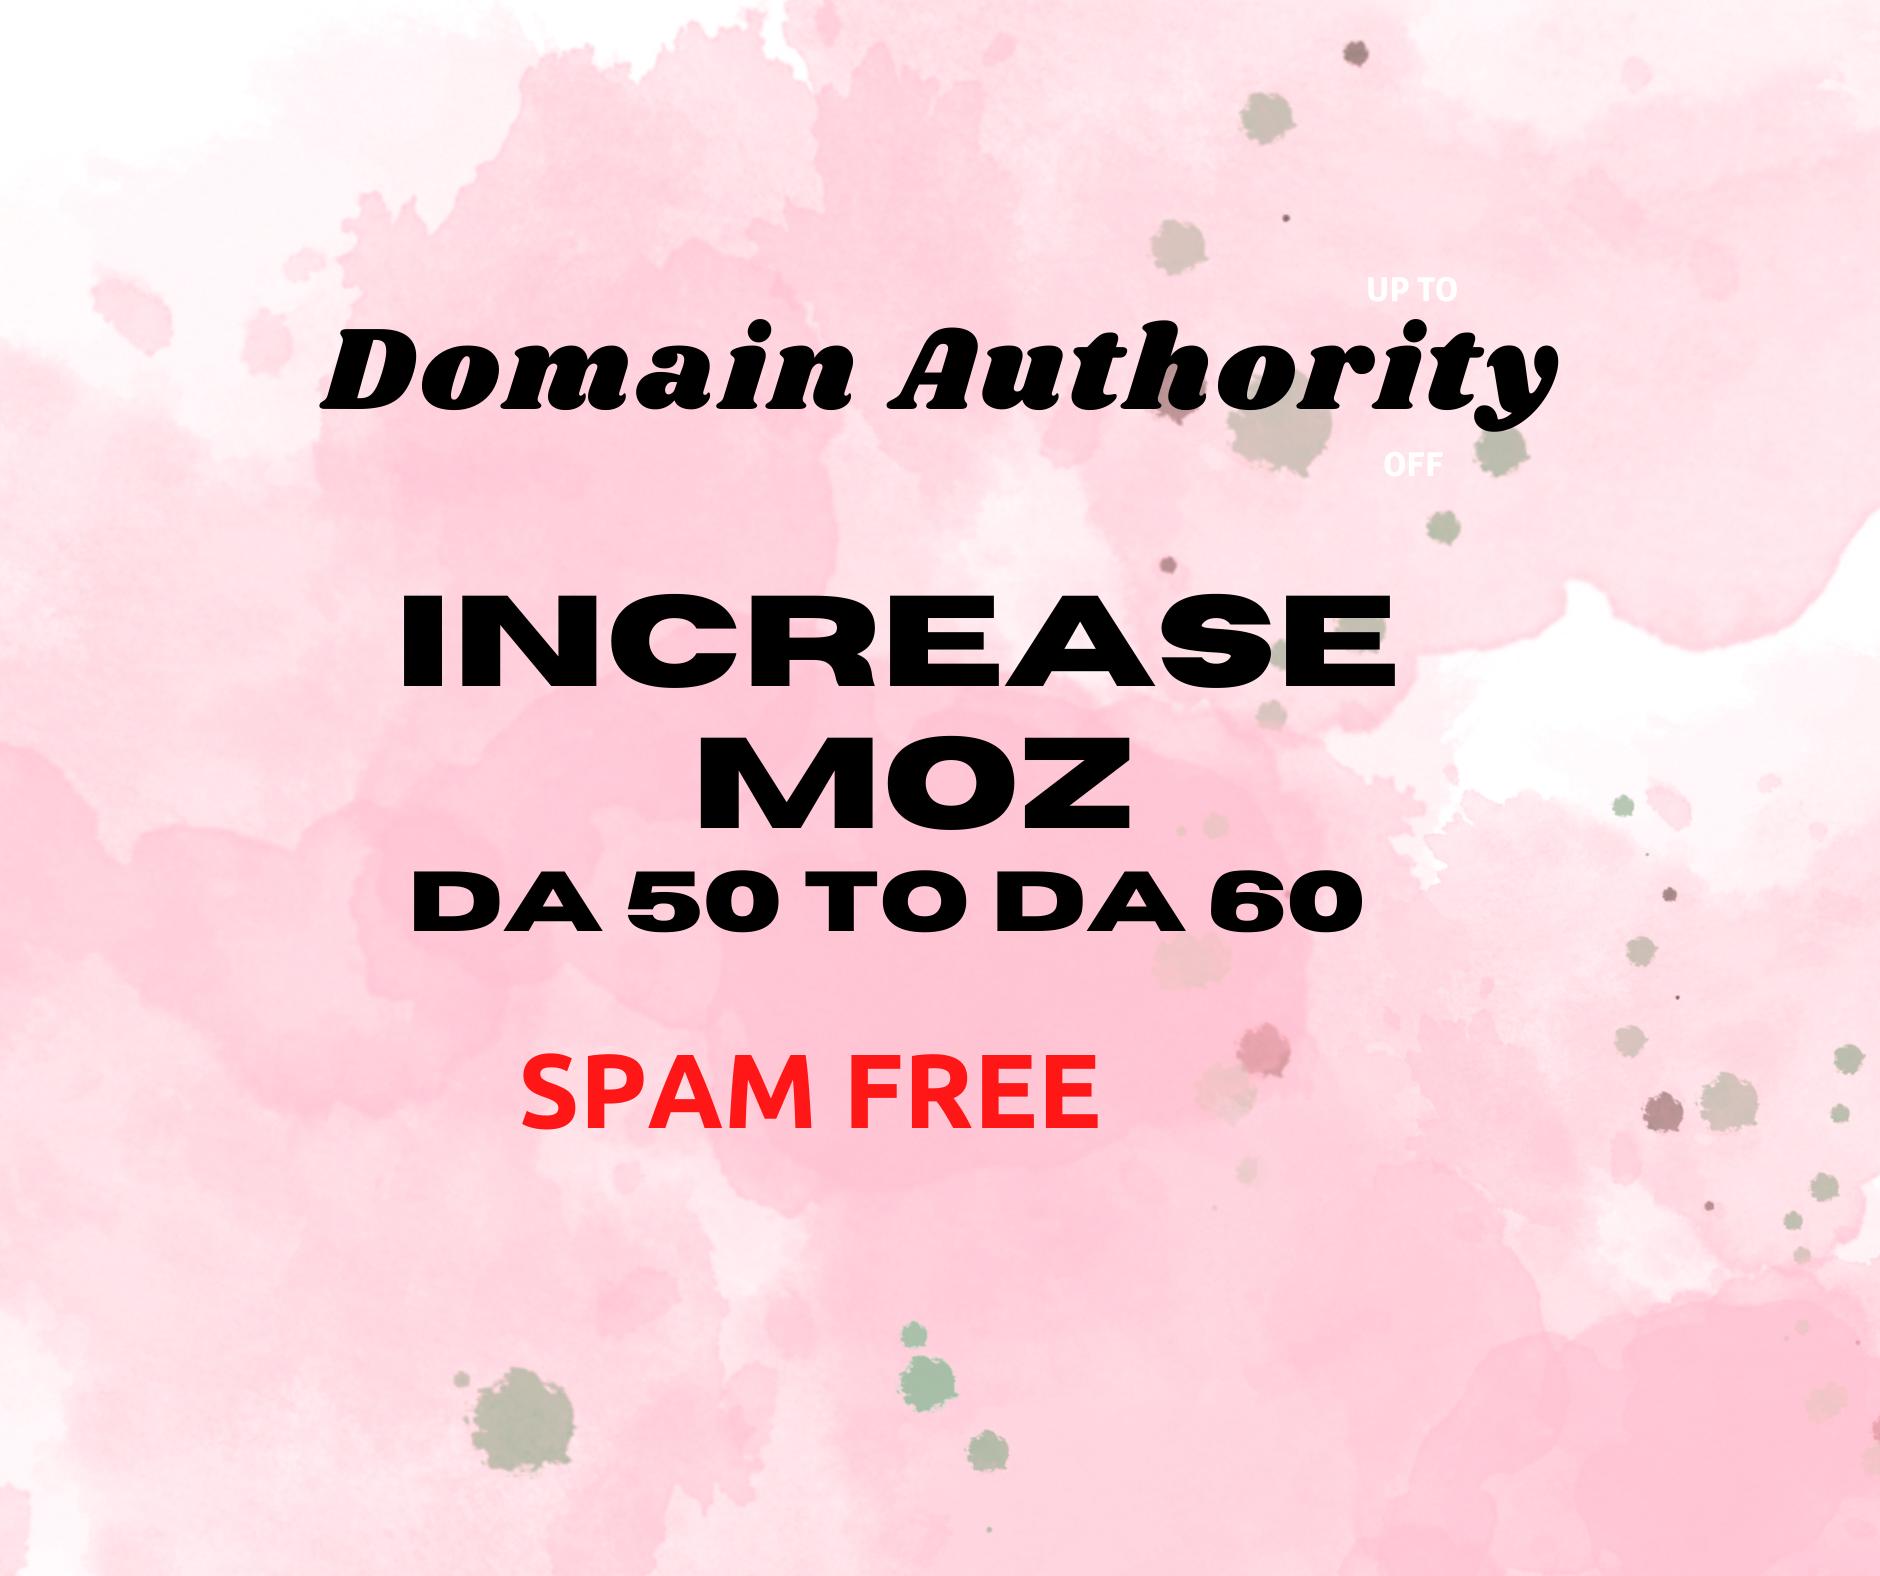 I will increase moz da increase moz da domain authority 50 plus